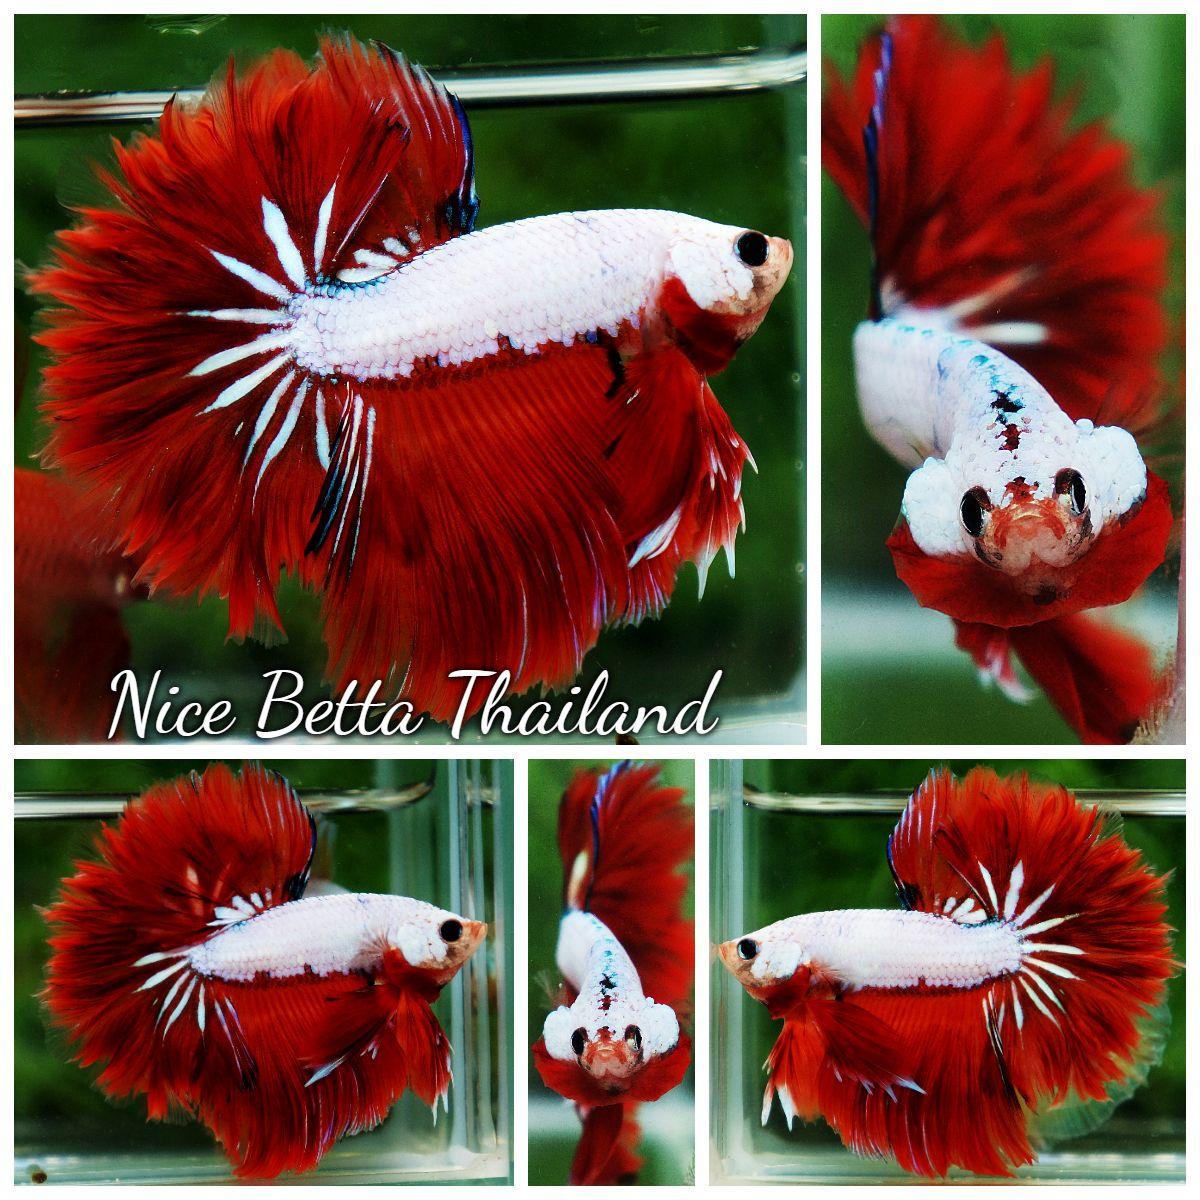 N03 05 Rose Tail Sunshine Dragon ปลาก ด